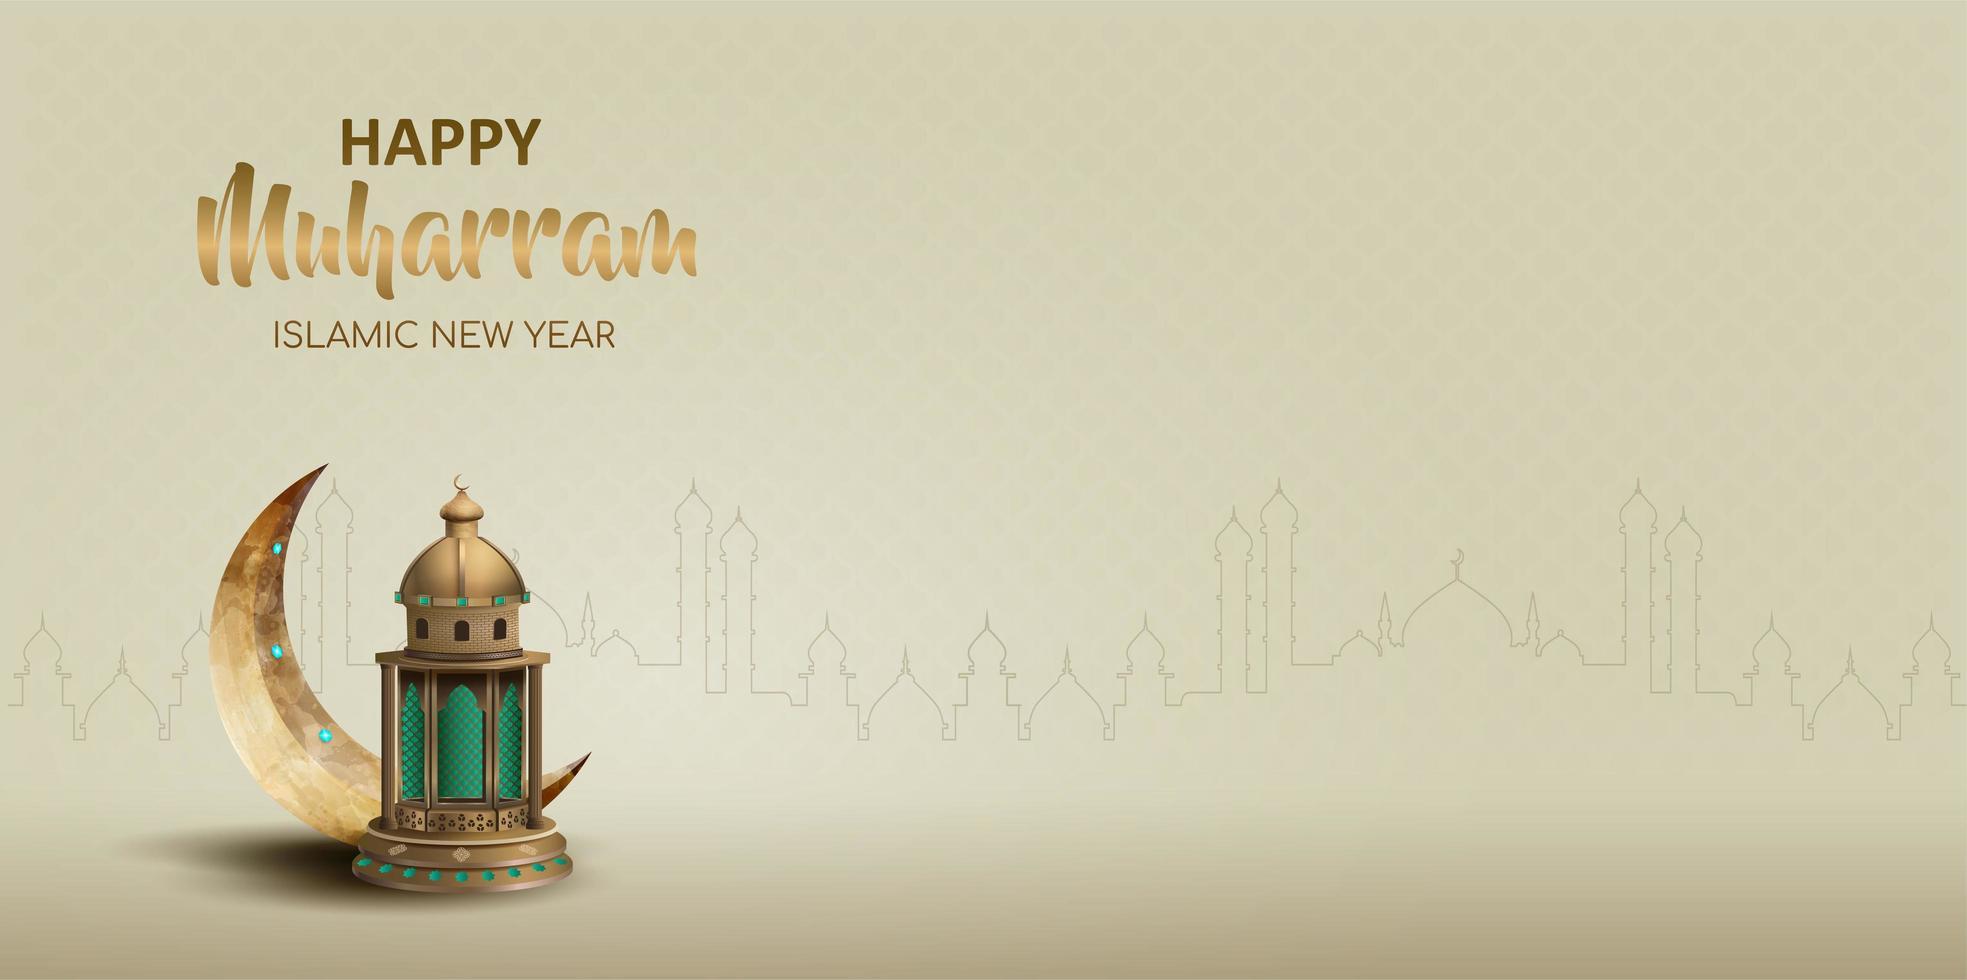 glad muharram islamisk nyårskortsdesign vektor